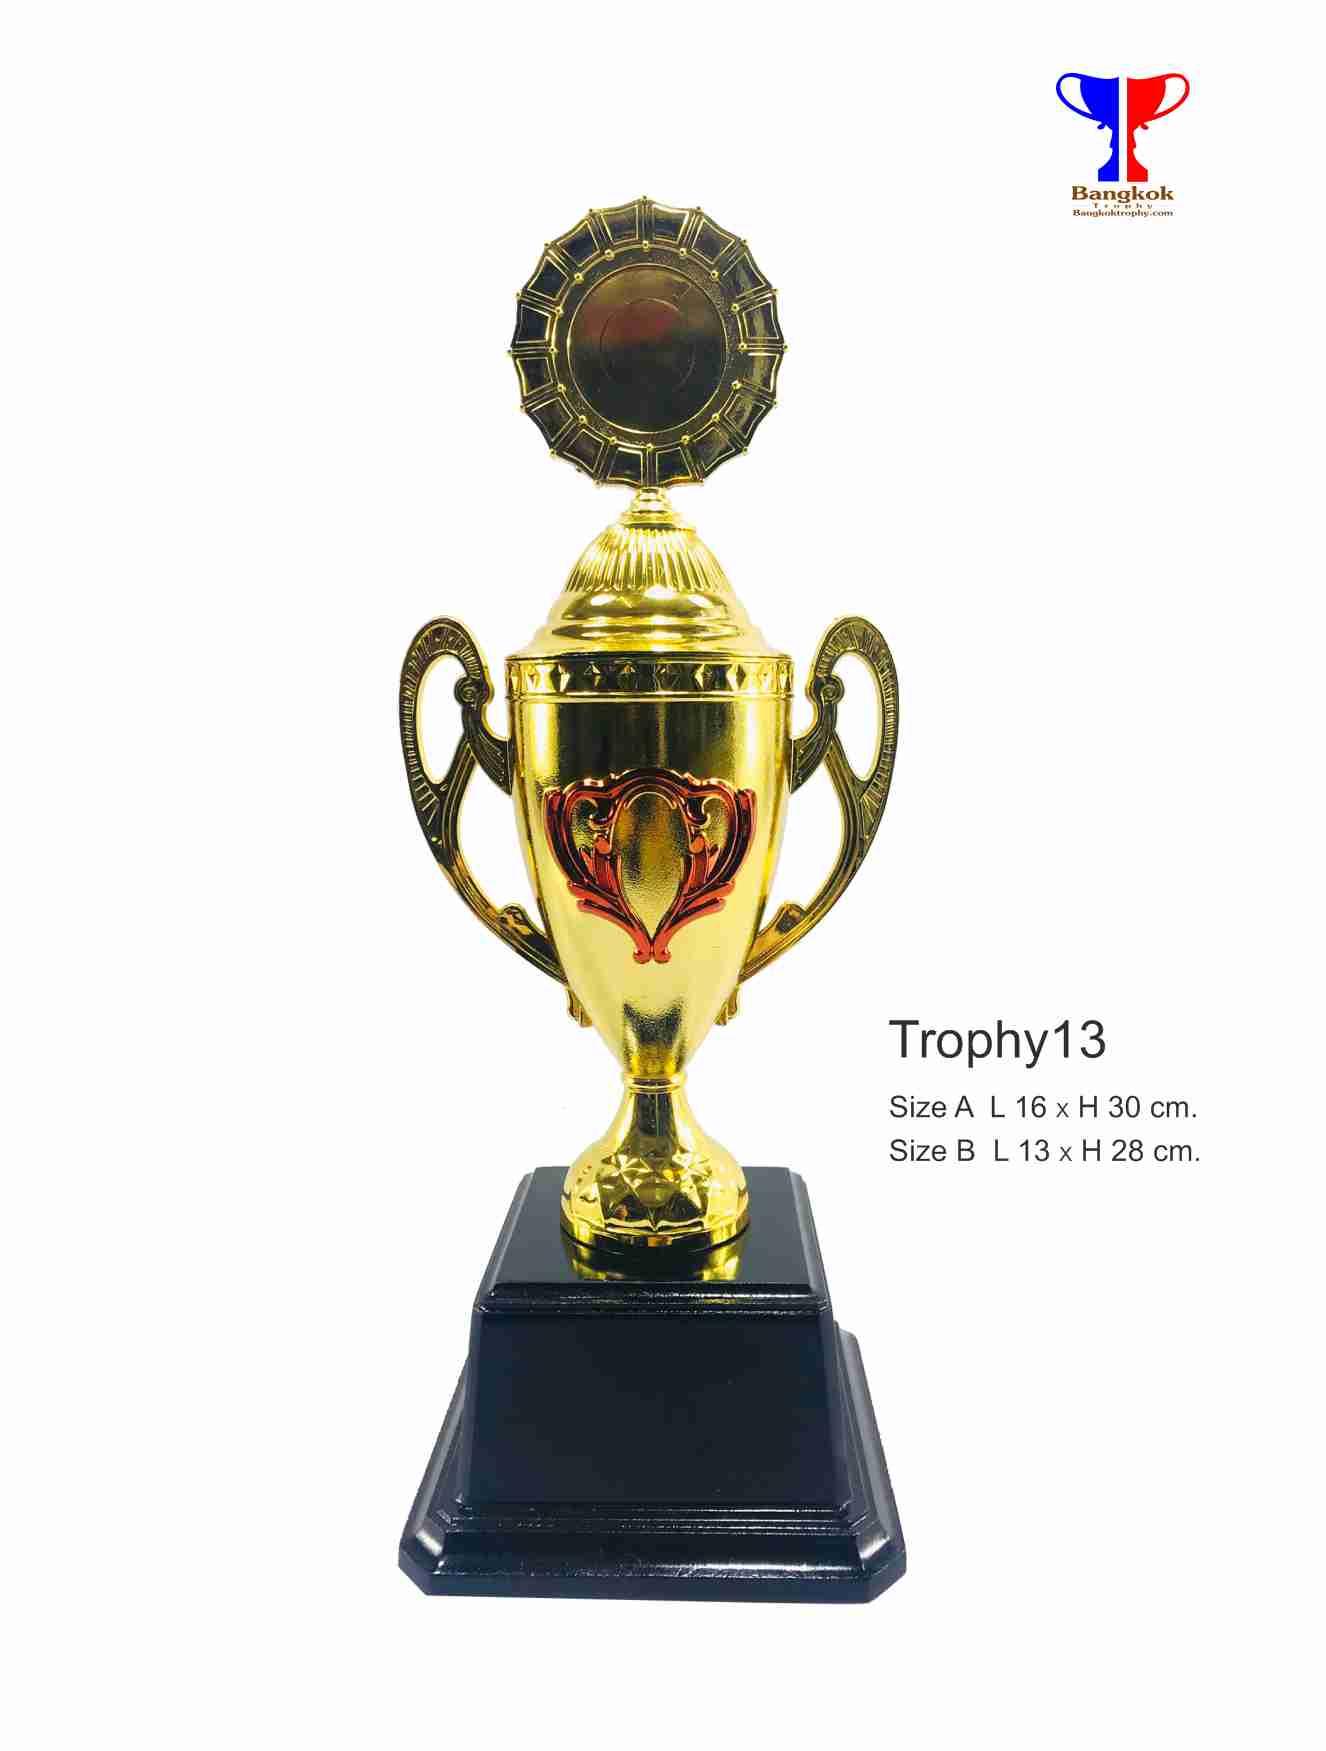 Trophy13